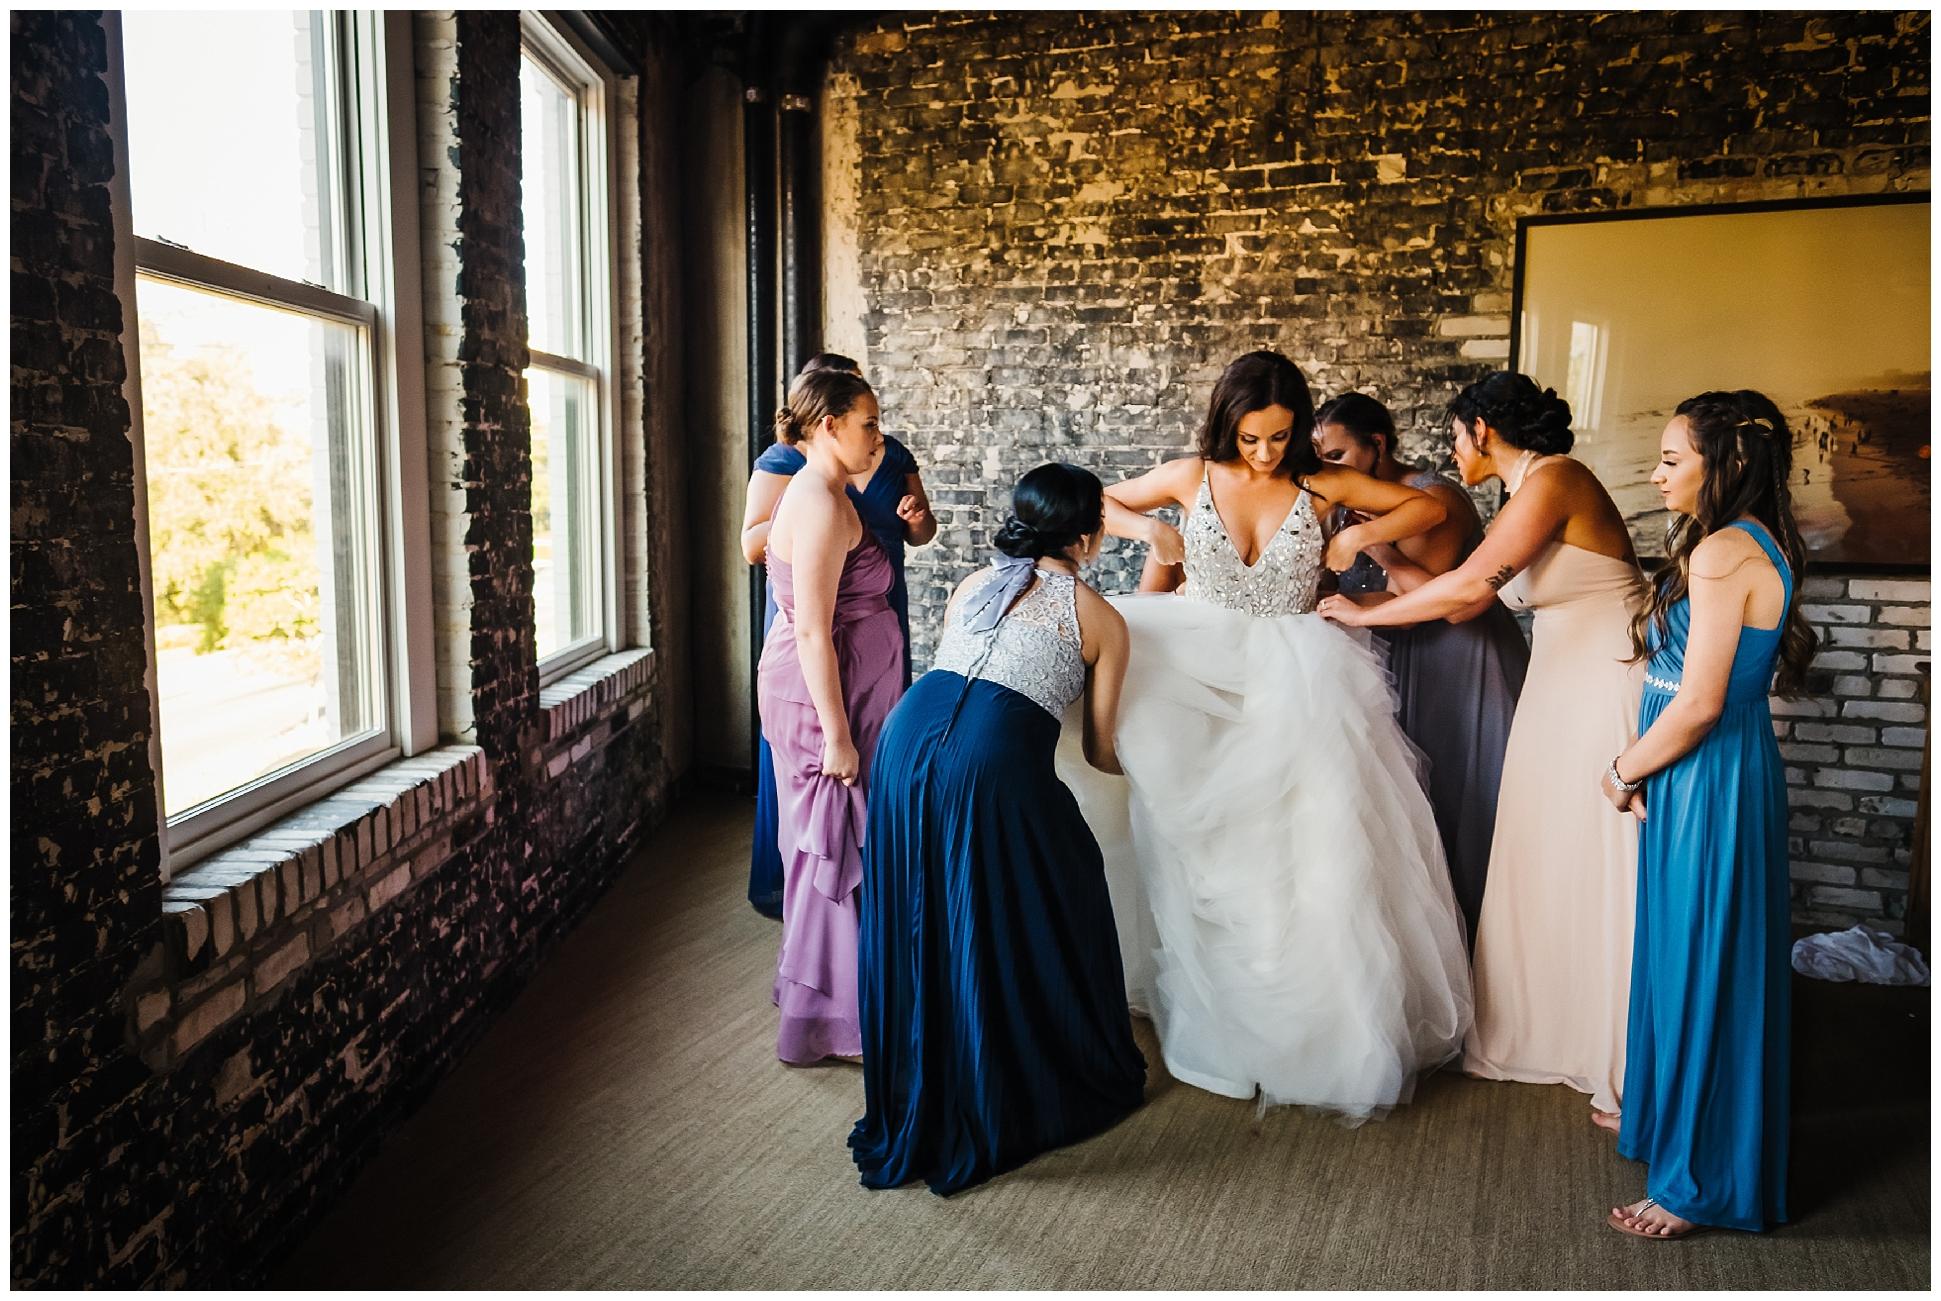 tampa-wedding-photographer-oxford-exchange-garland-candlelight-gold-hayley-paige_0012.jpg